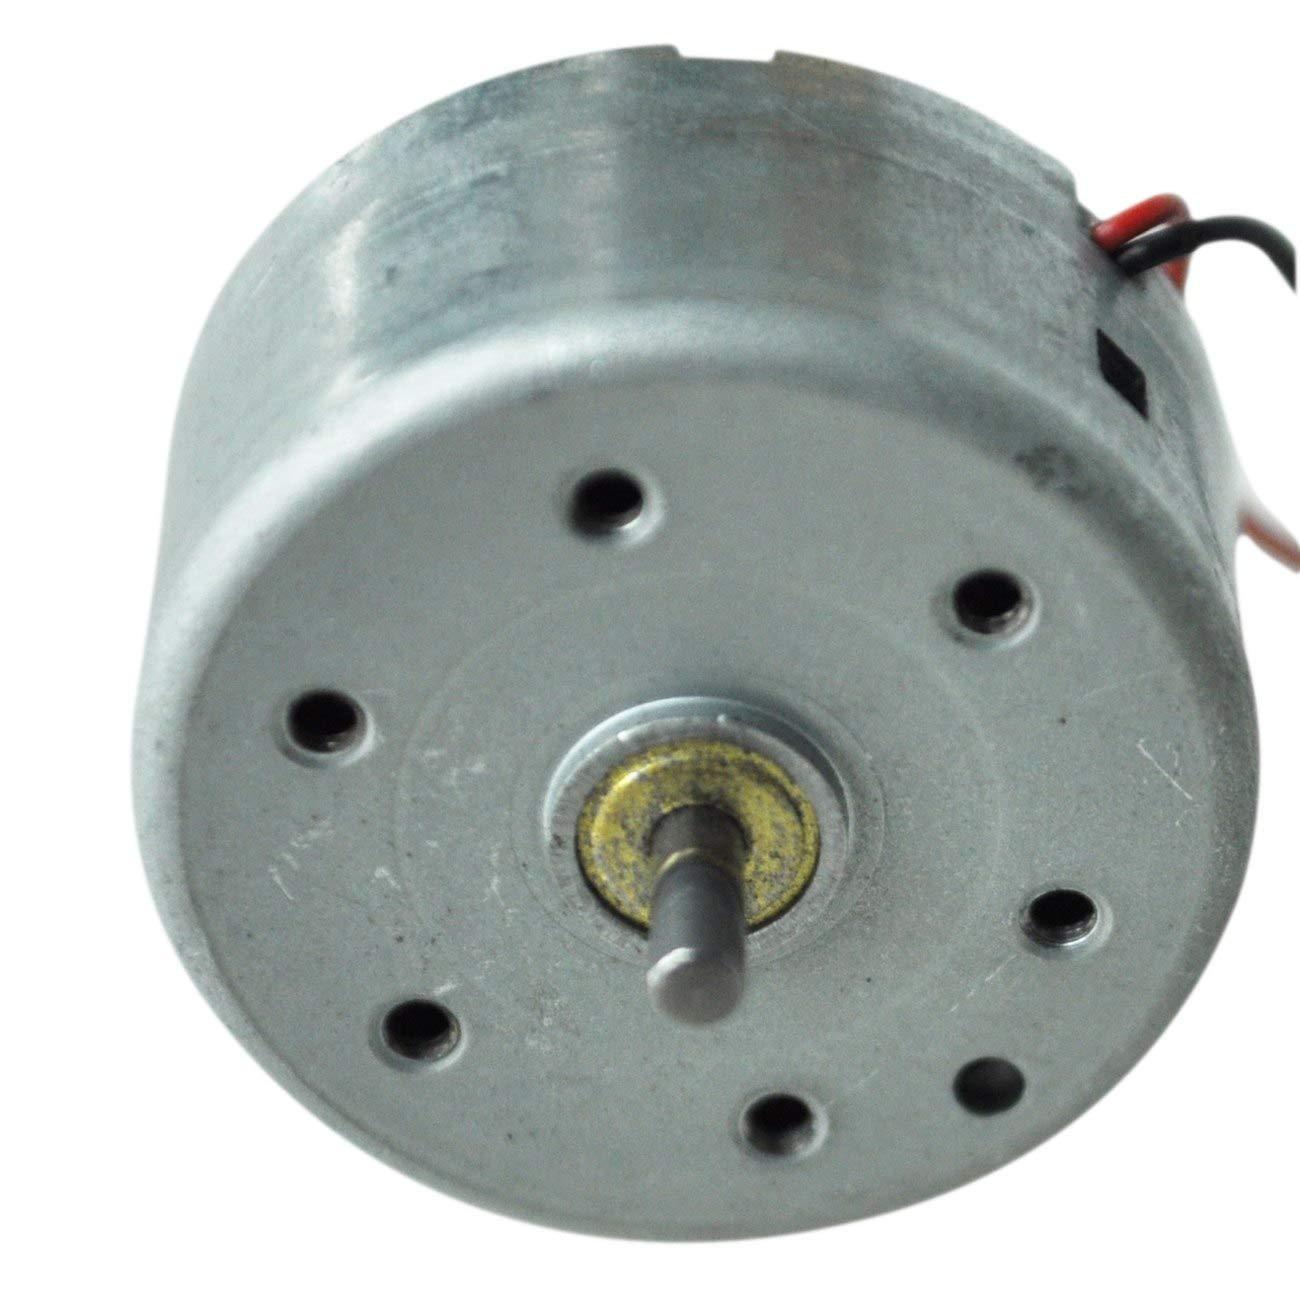 1700-7300RPM 1.5-6.5V High Torque Cylinder Electric Mini DC Motor